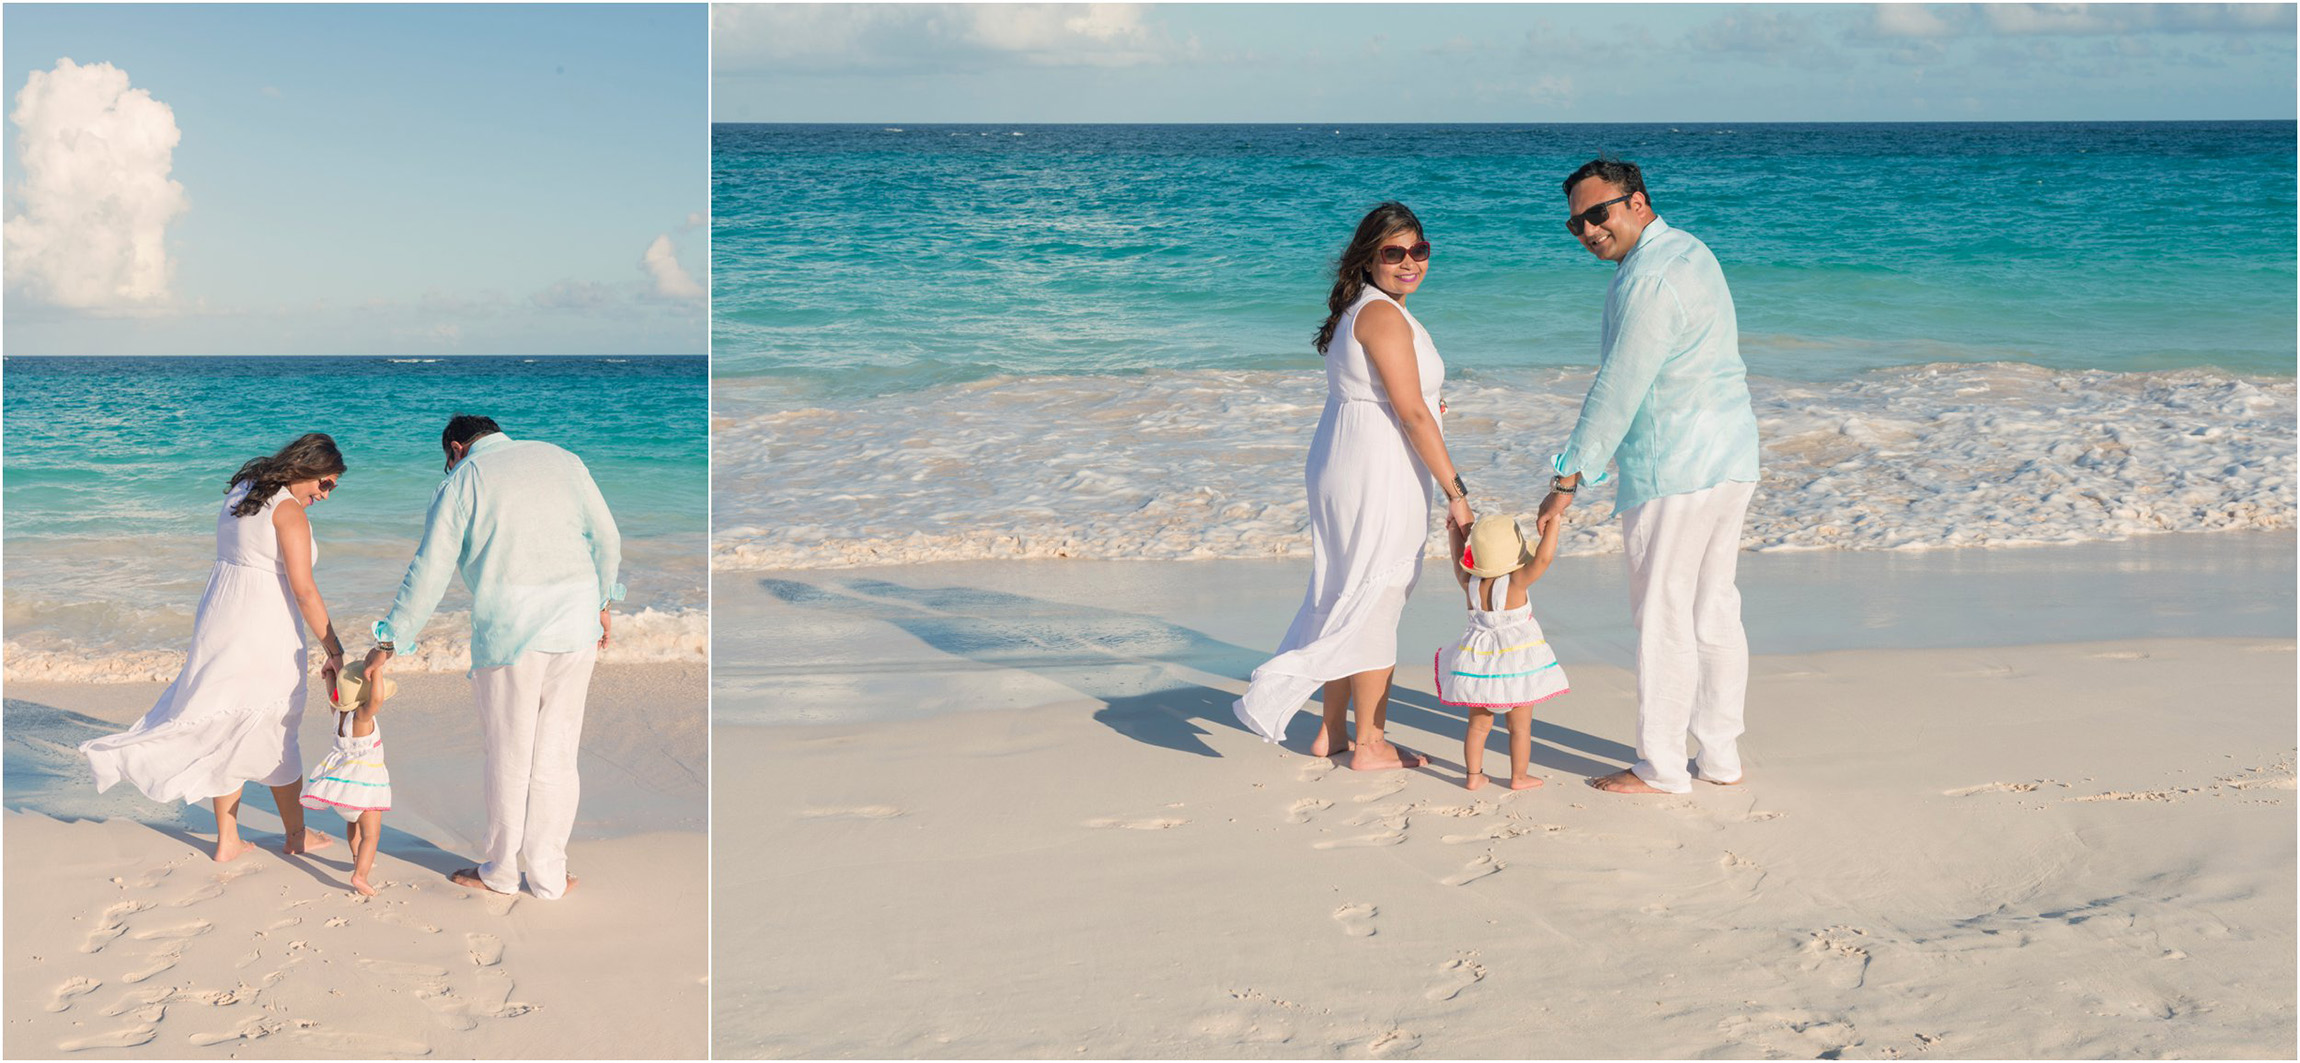 ©FianderFoto_Bermuda Photographer_Elbow Beach_Malav_001.jpg